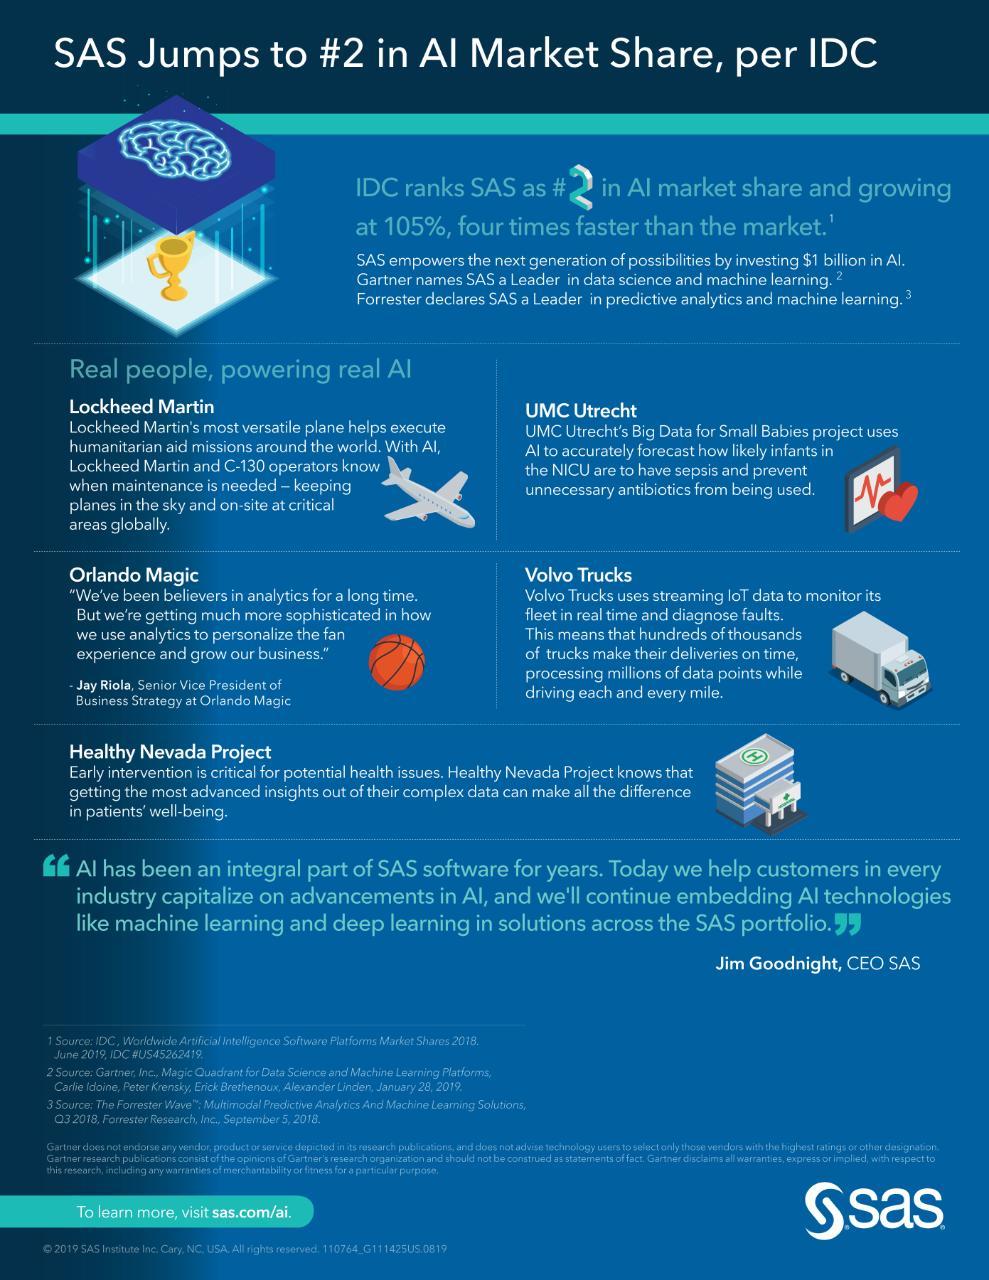 SAS Jumps to #2 in AI Market Share, per IDC